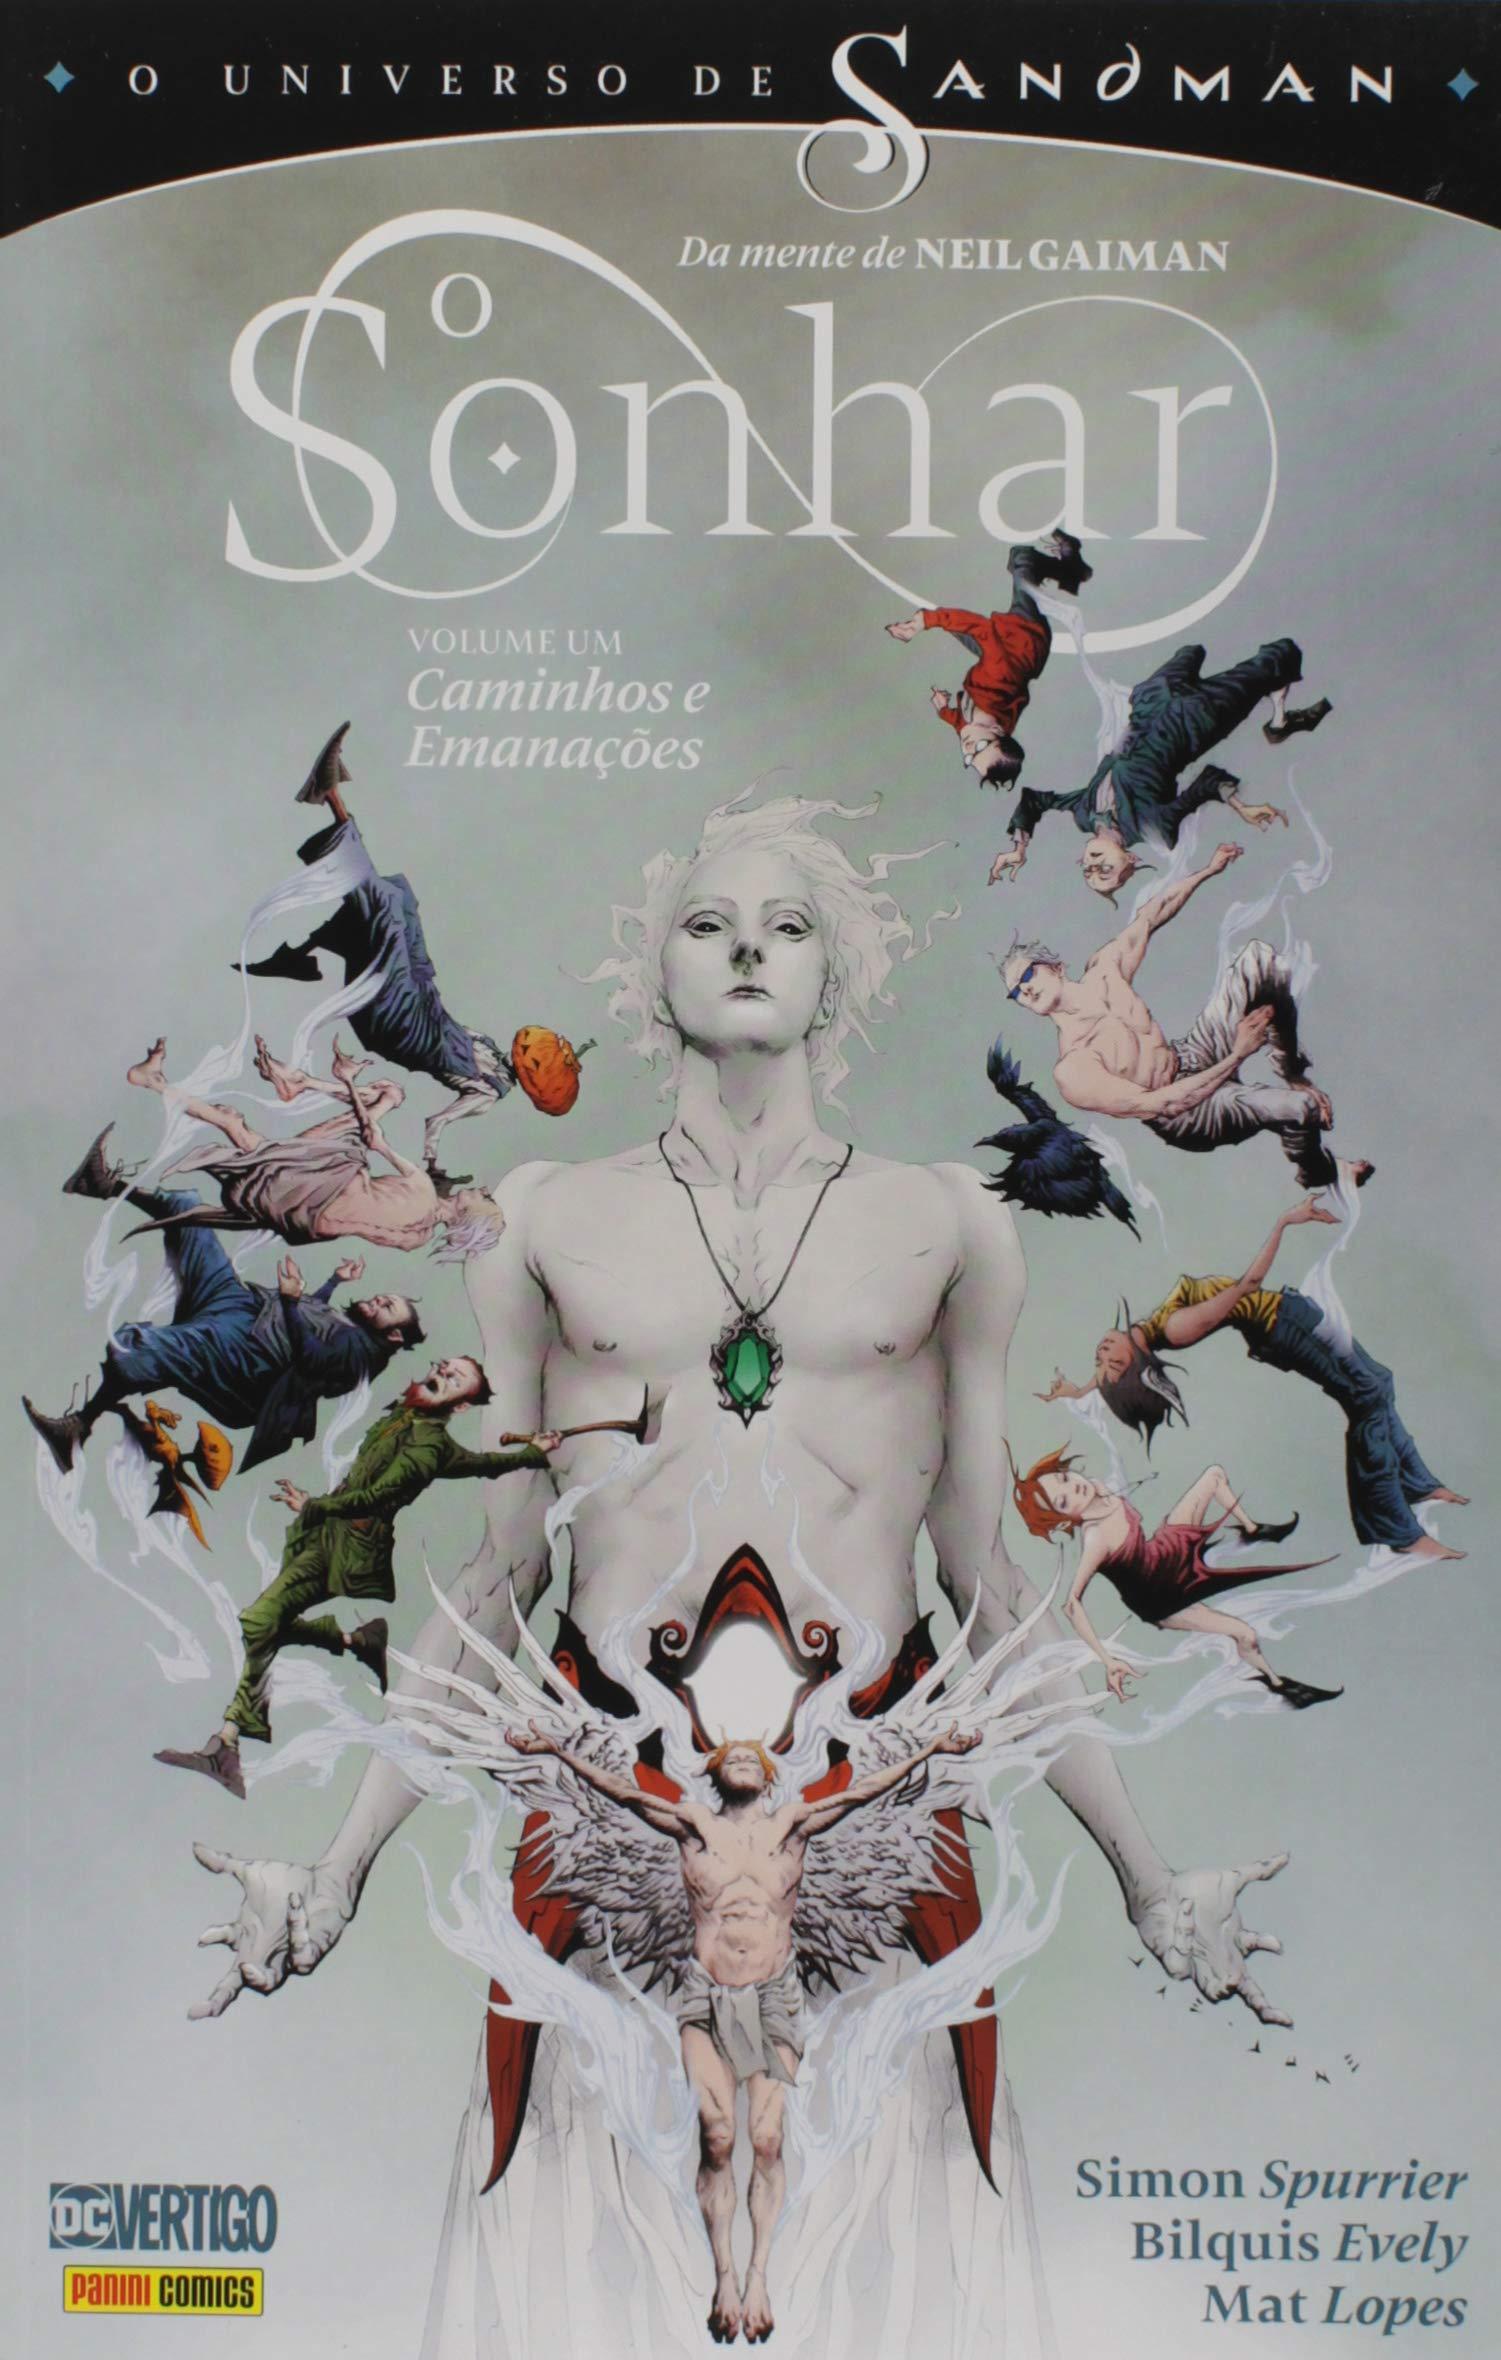 Resenha | O Universo de Sandman: O Sonhar – Volume 1